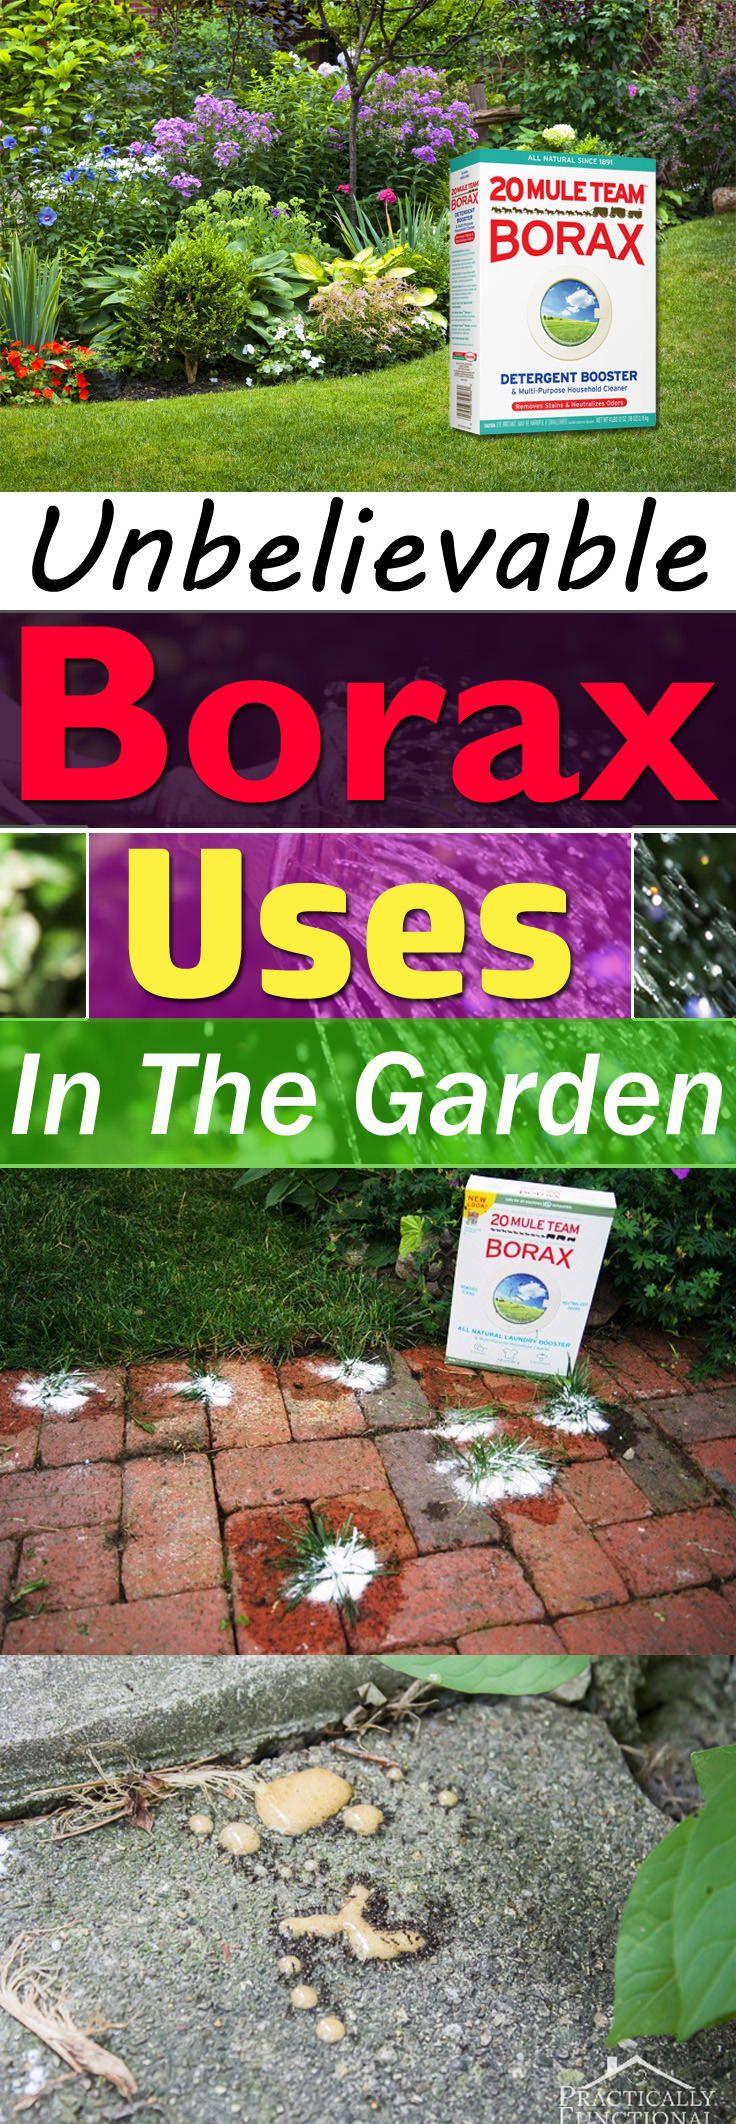 Is Borax Safe For Vegetable Gardens